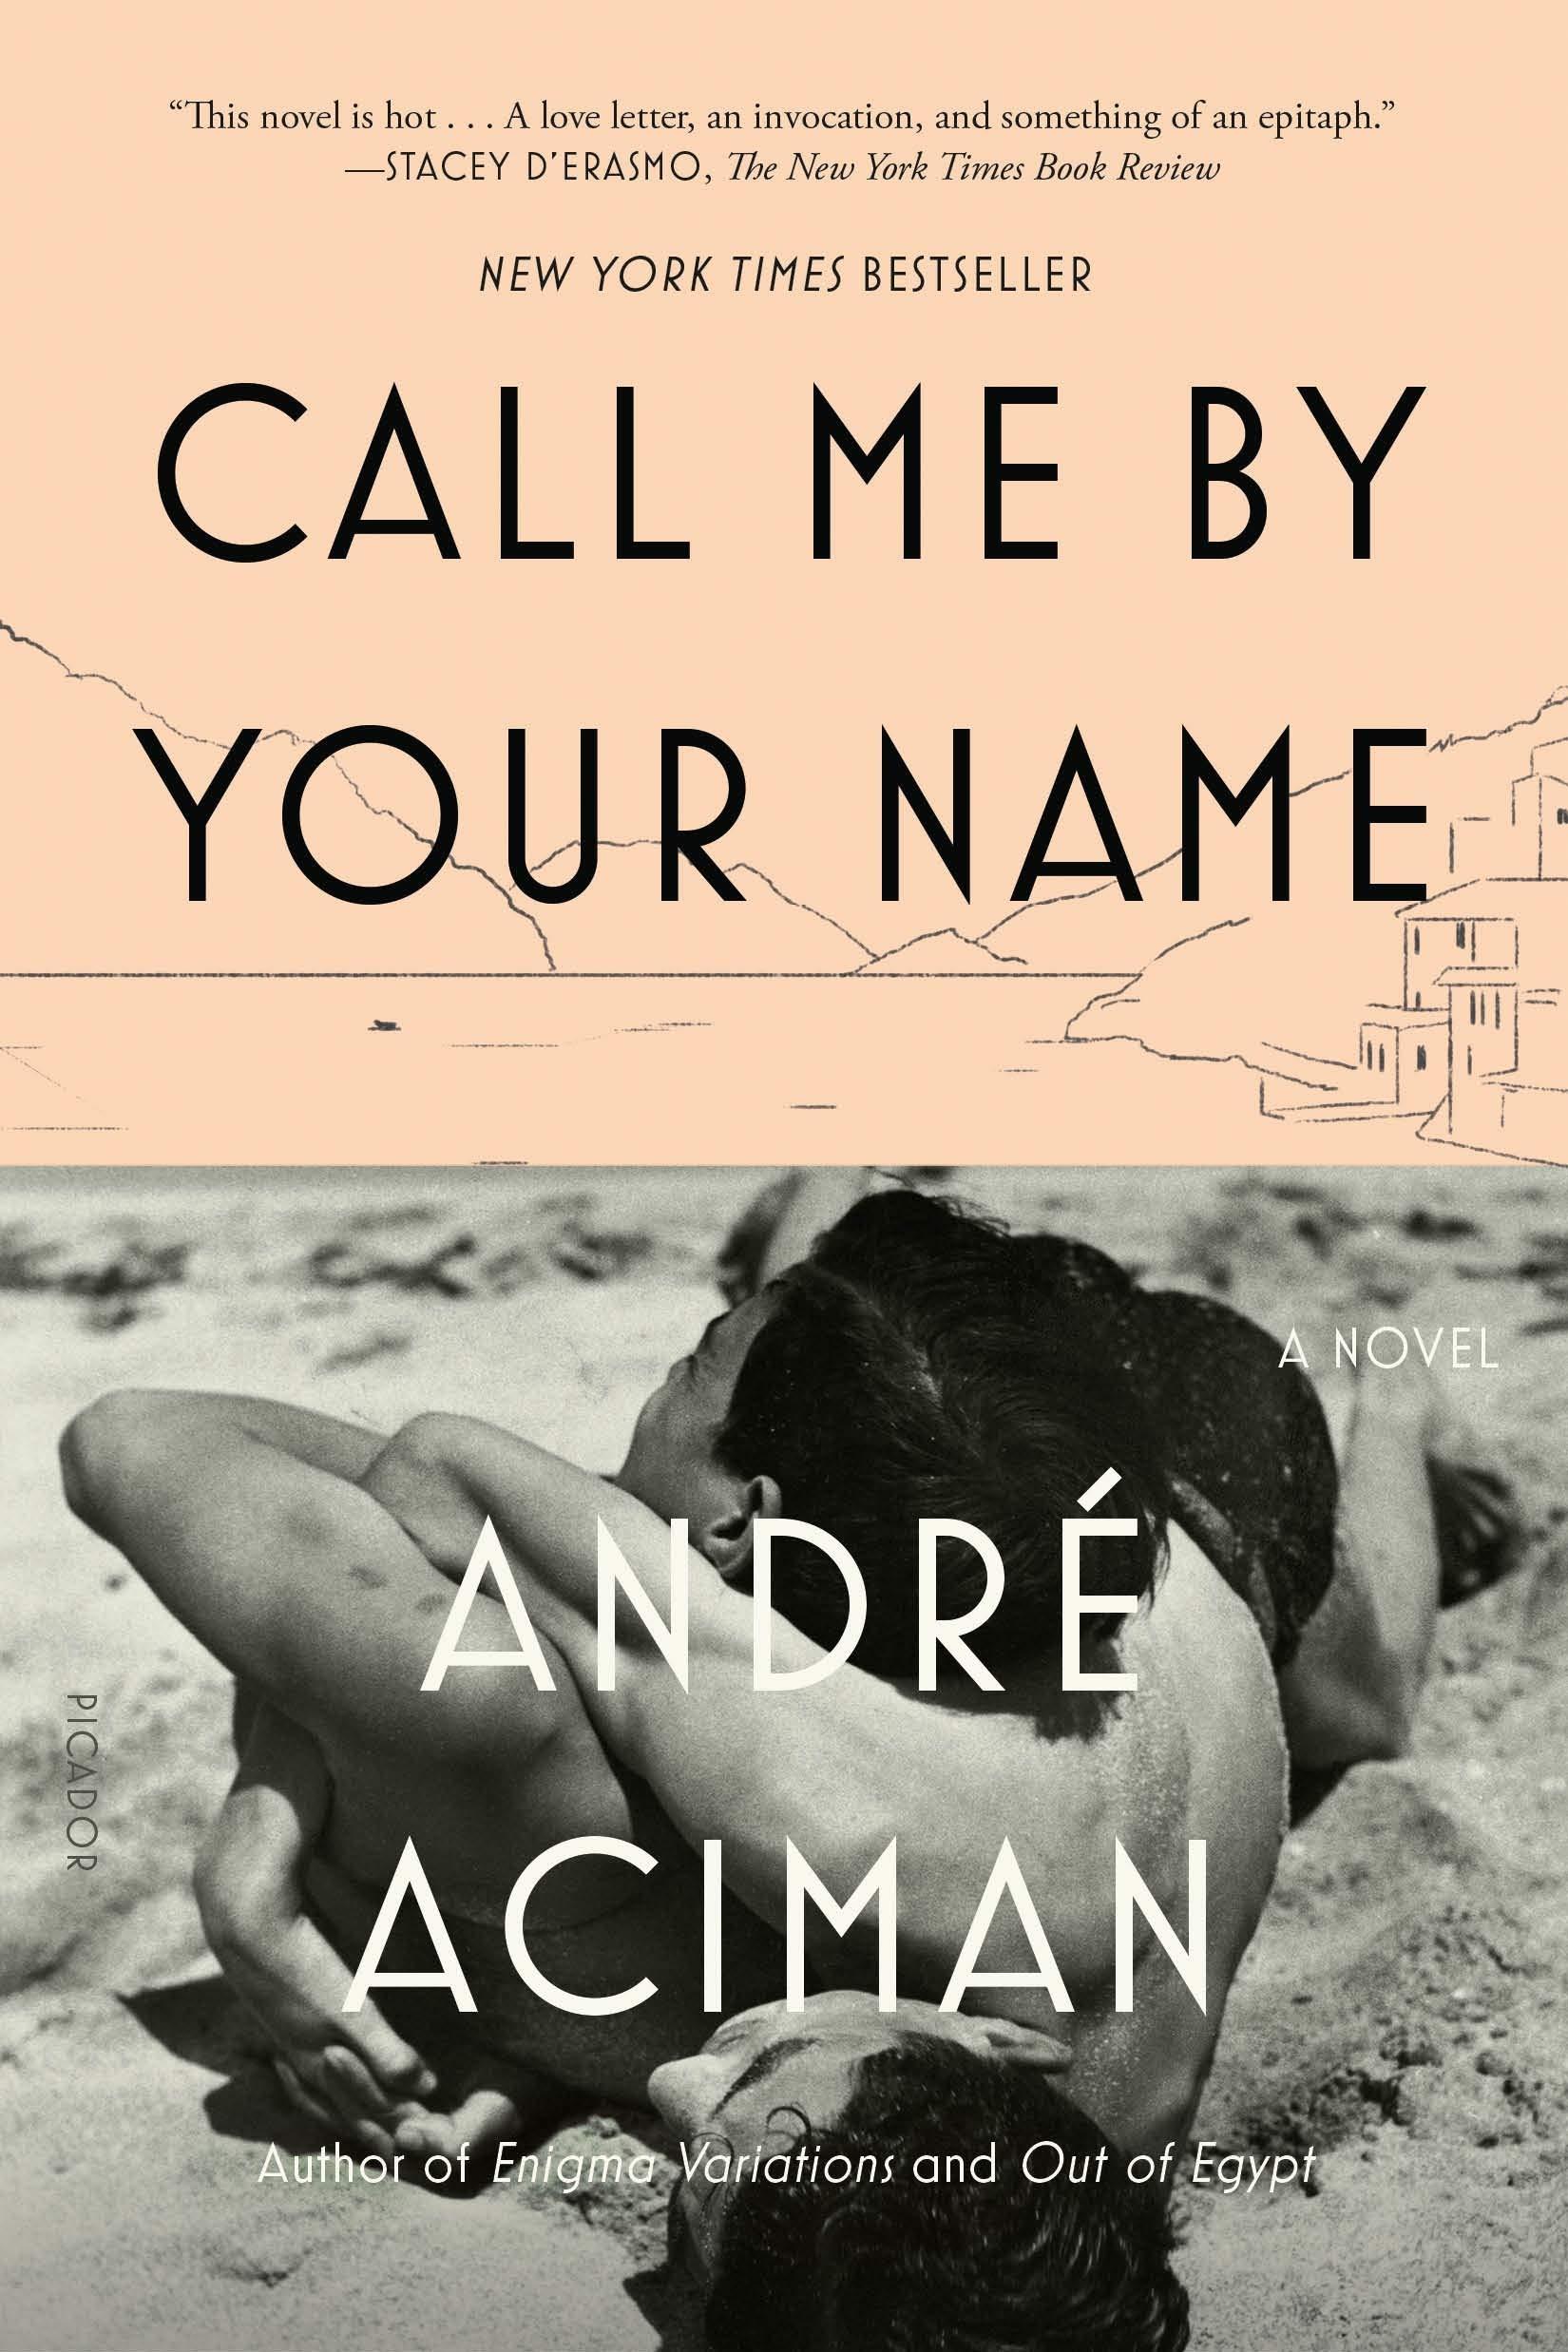 amazoncom call me by your name a novel 9780312426781 andr aciman books